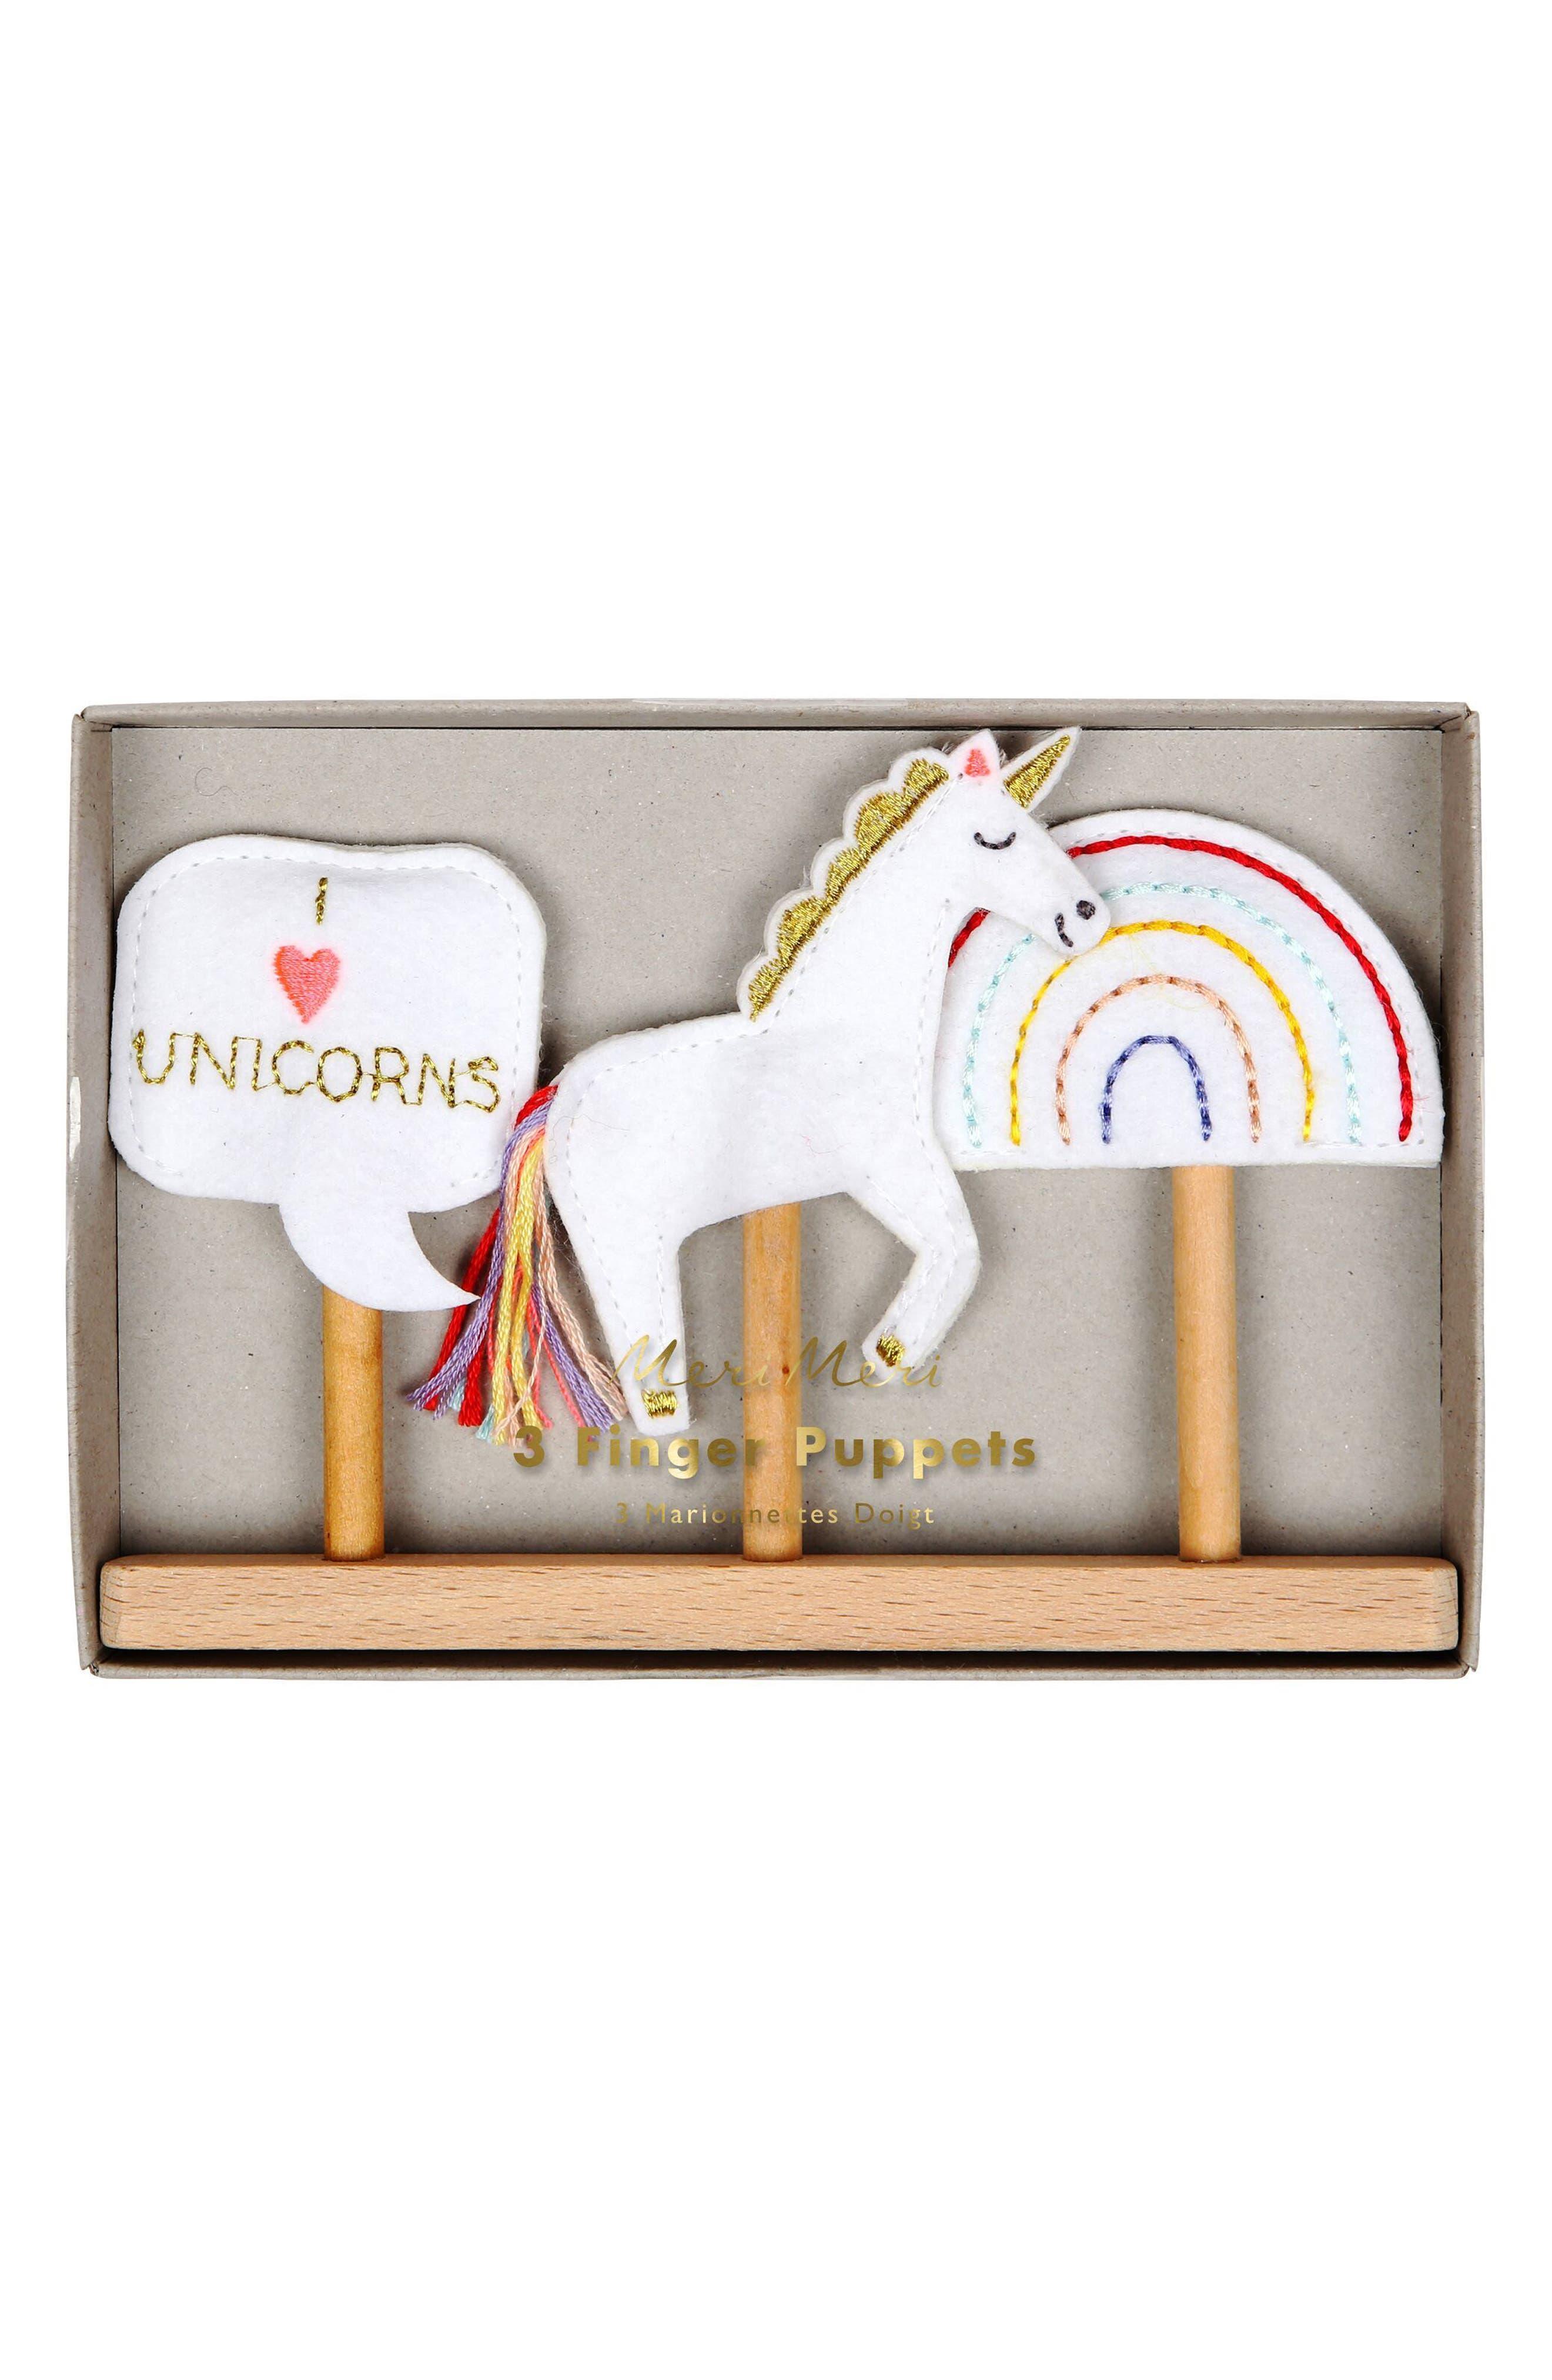 Set of 3 Unicorn Finger Puppets,                             Main thumbnail 1, color,                             000